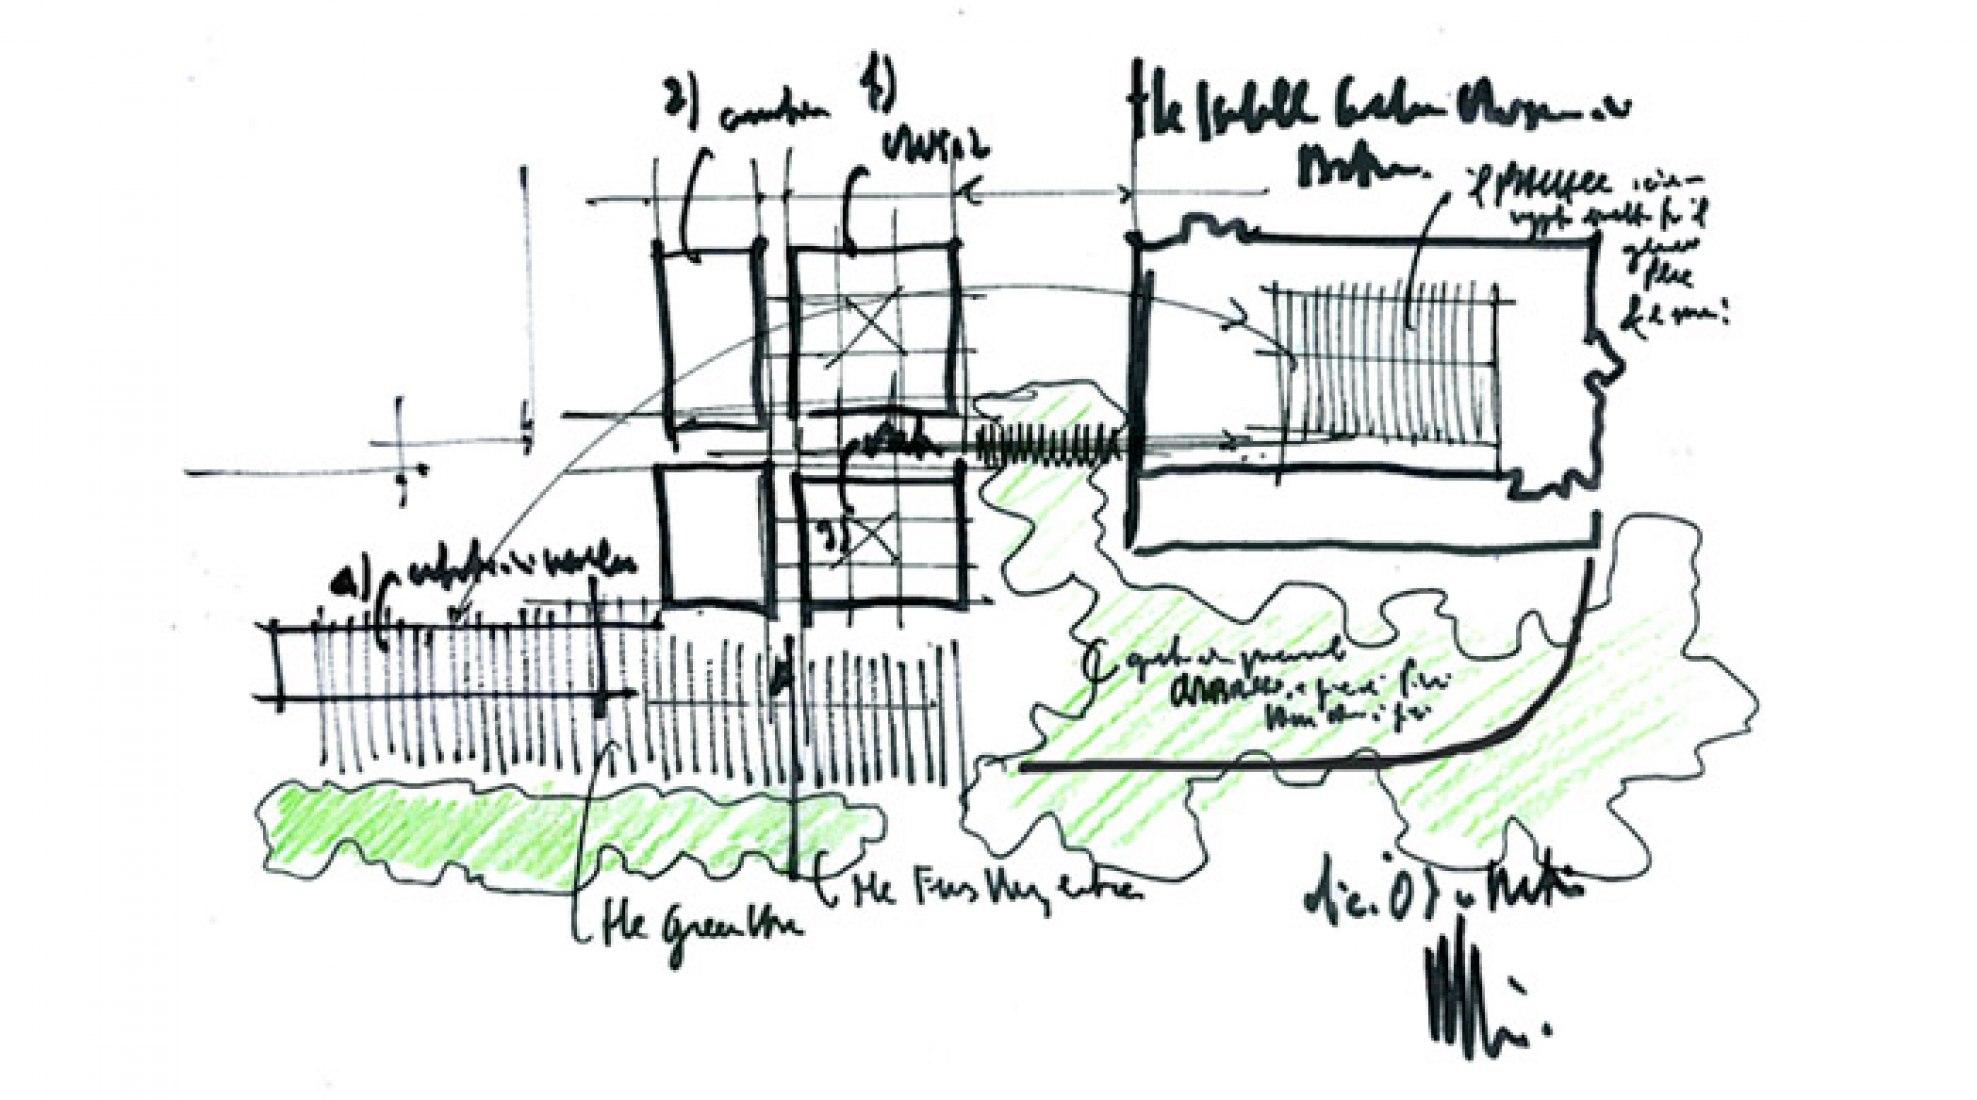 Site Plan of the Isabella Stewart Gardner Museum, Boston. © RENZO PIANO BUILDING WORKSHOP, 2010.